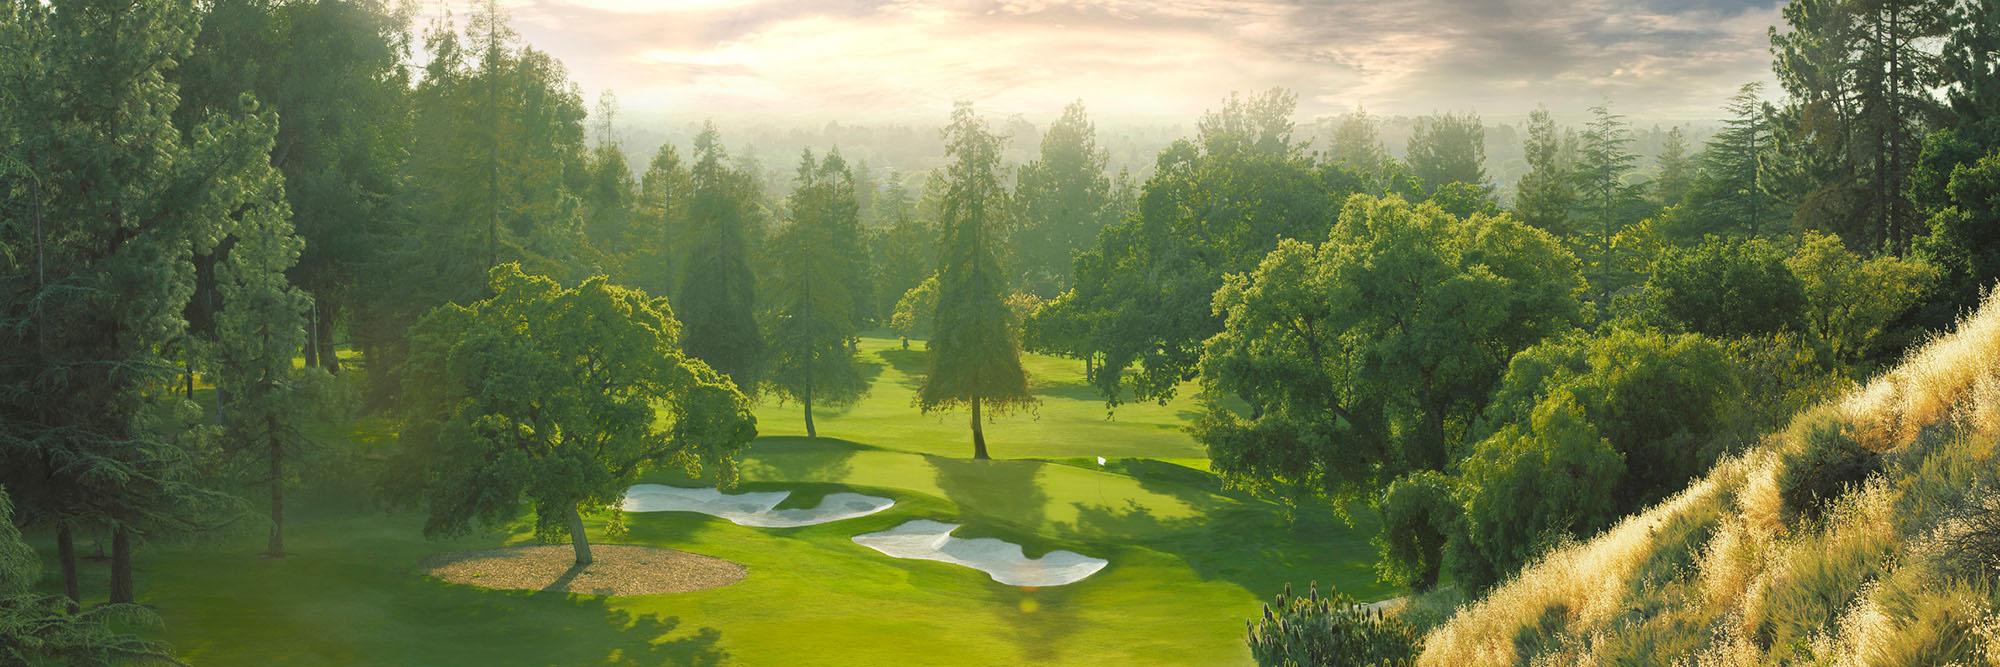 Golf Course Image - San Jose Country Club No. 7